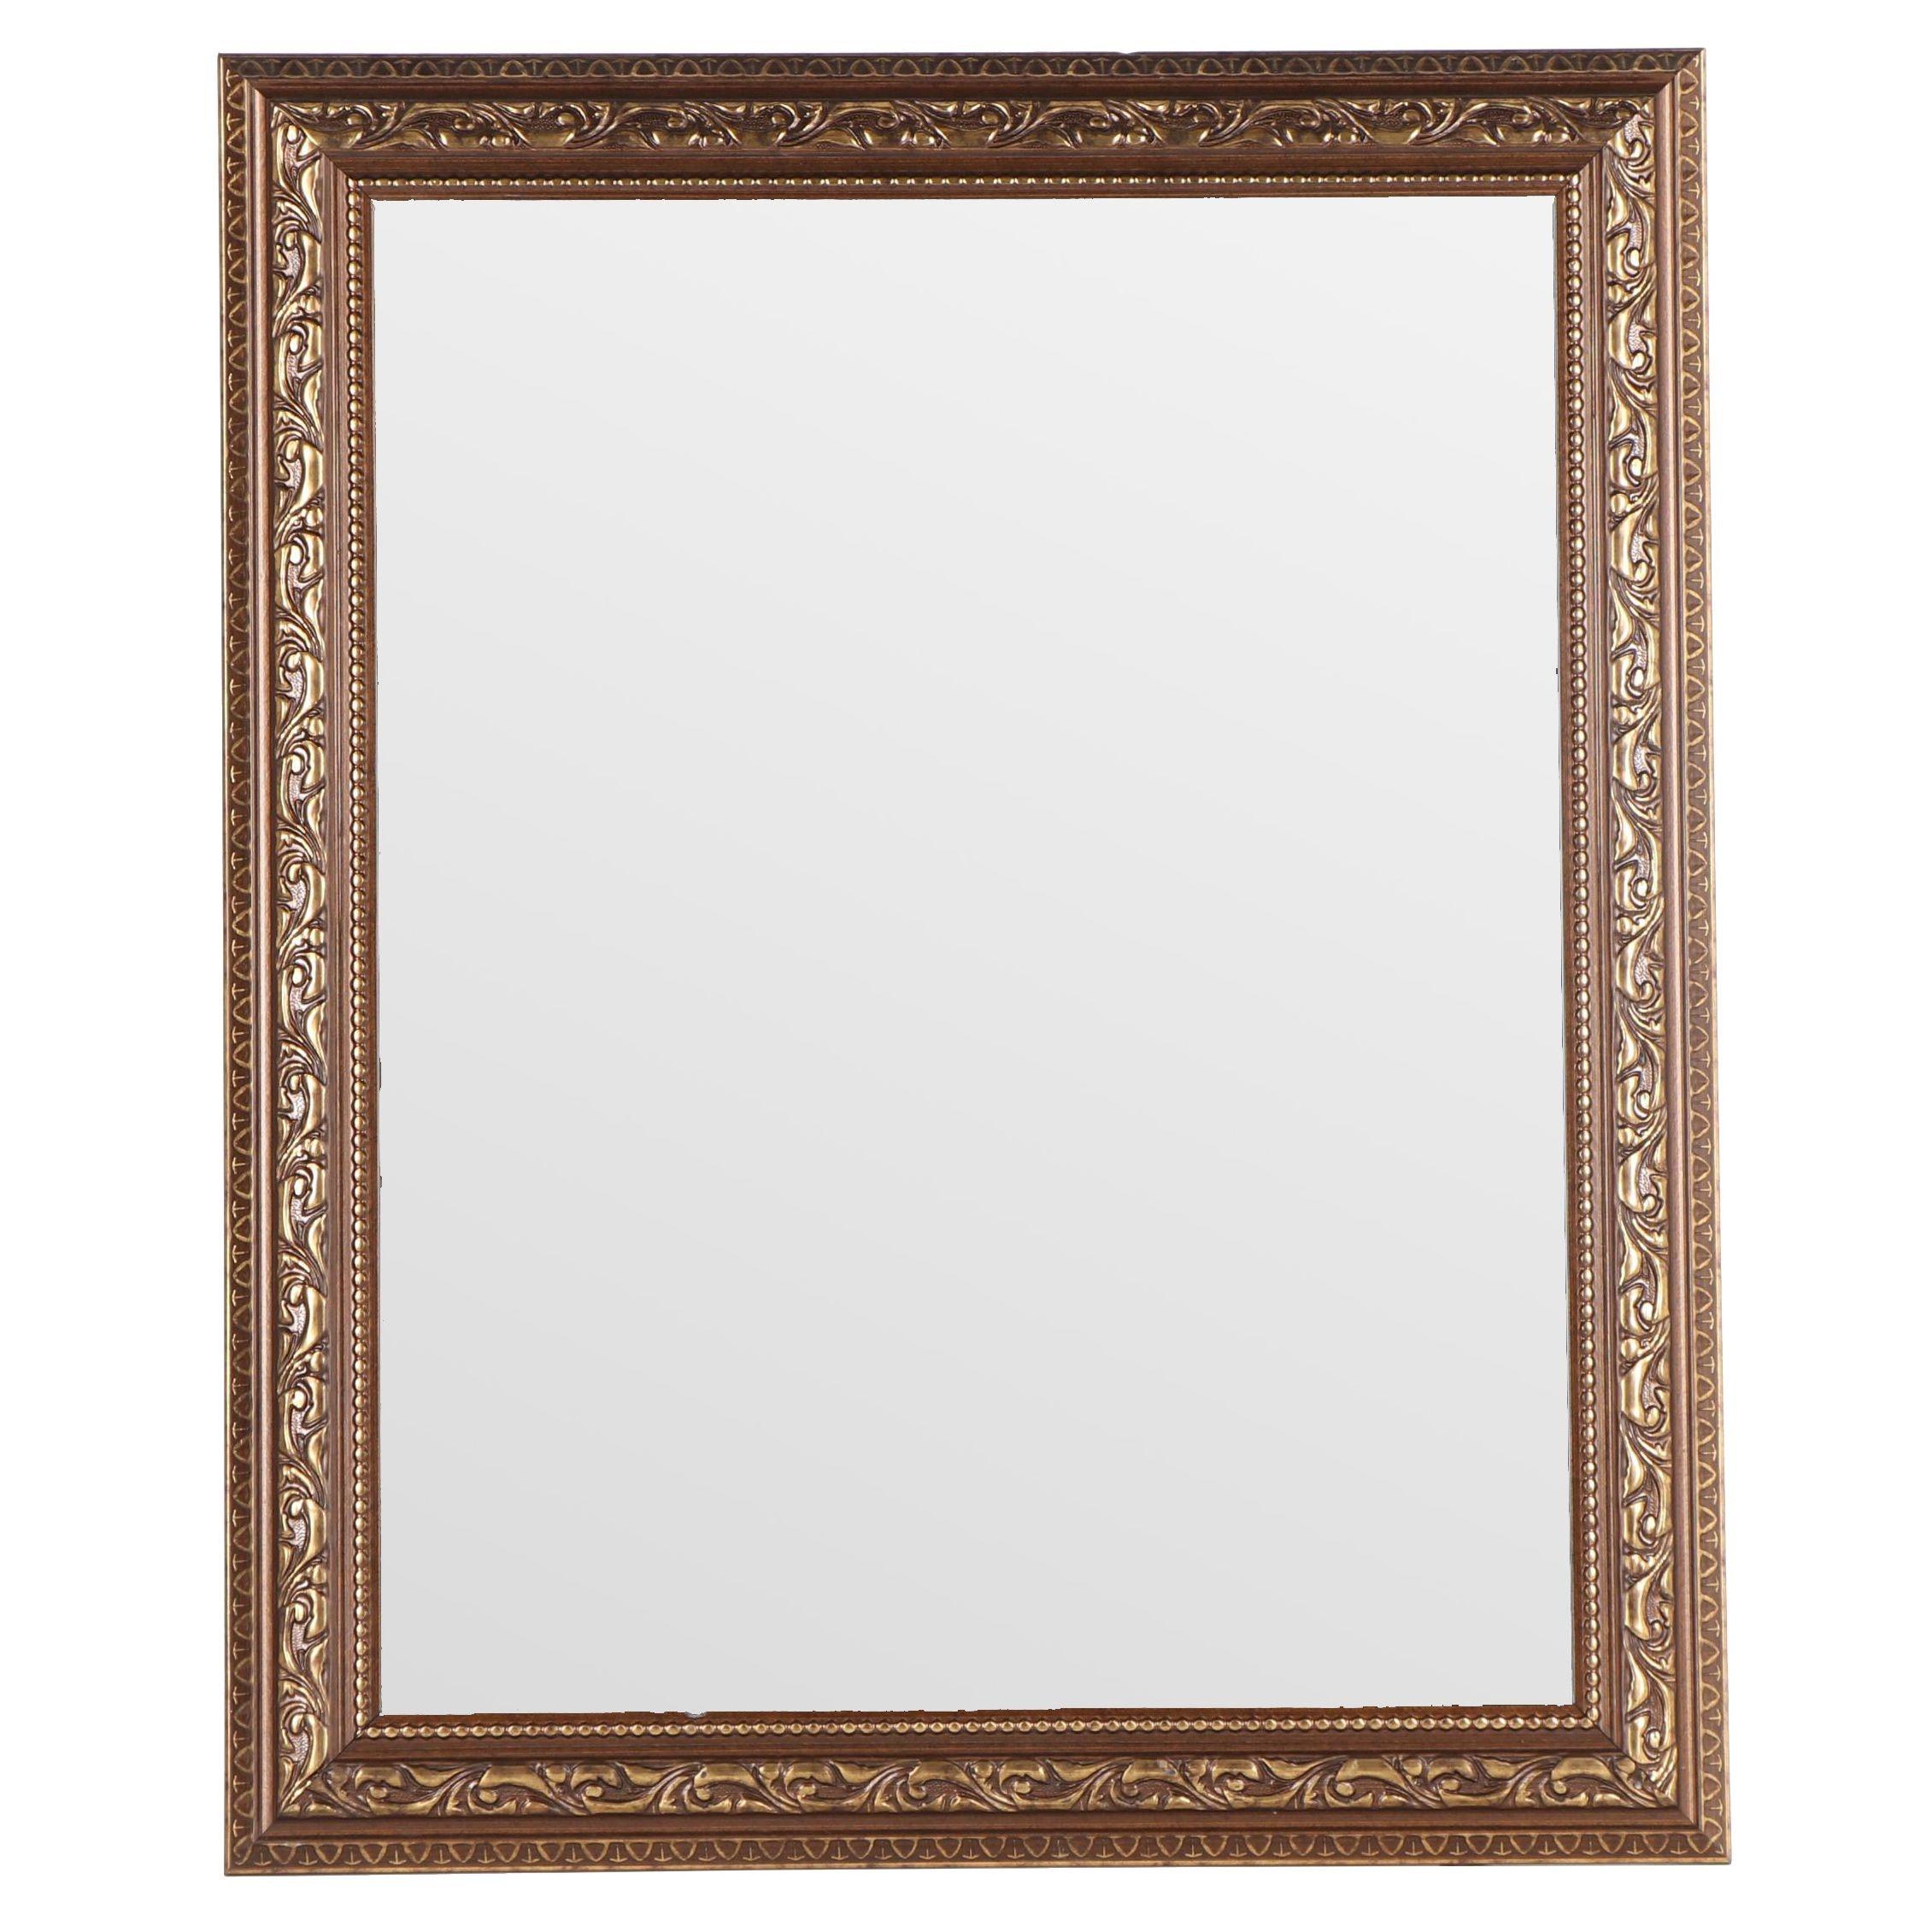 Beveled Mirror with Metallic Foliate Themed Frame